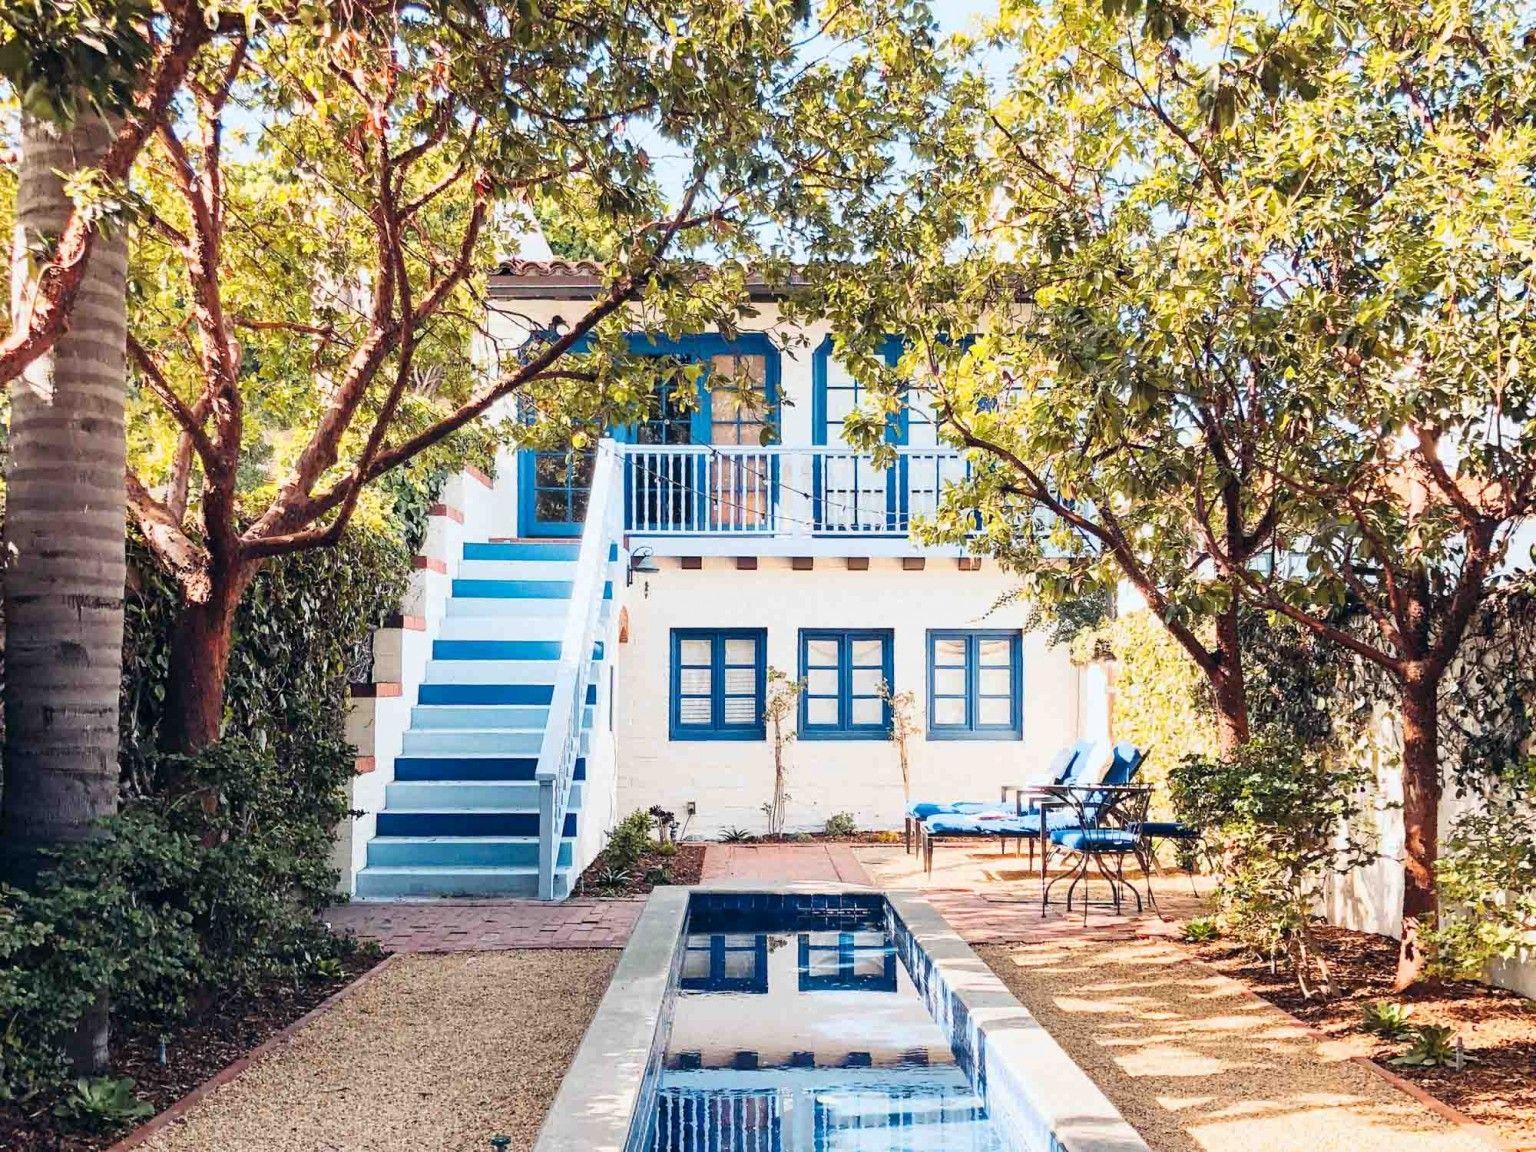 Top-Rated Attractions in Santa Barbara, California - Travl